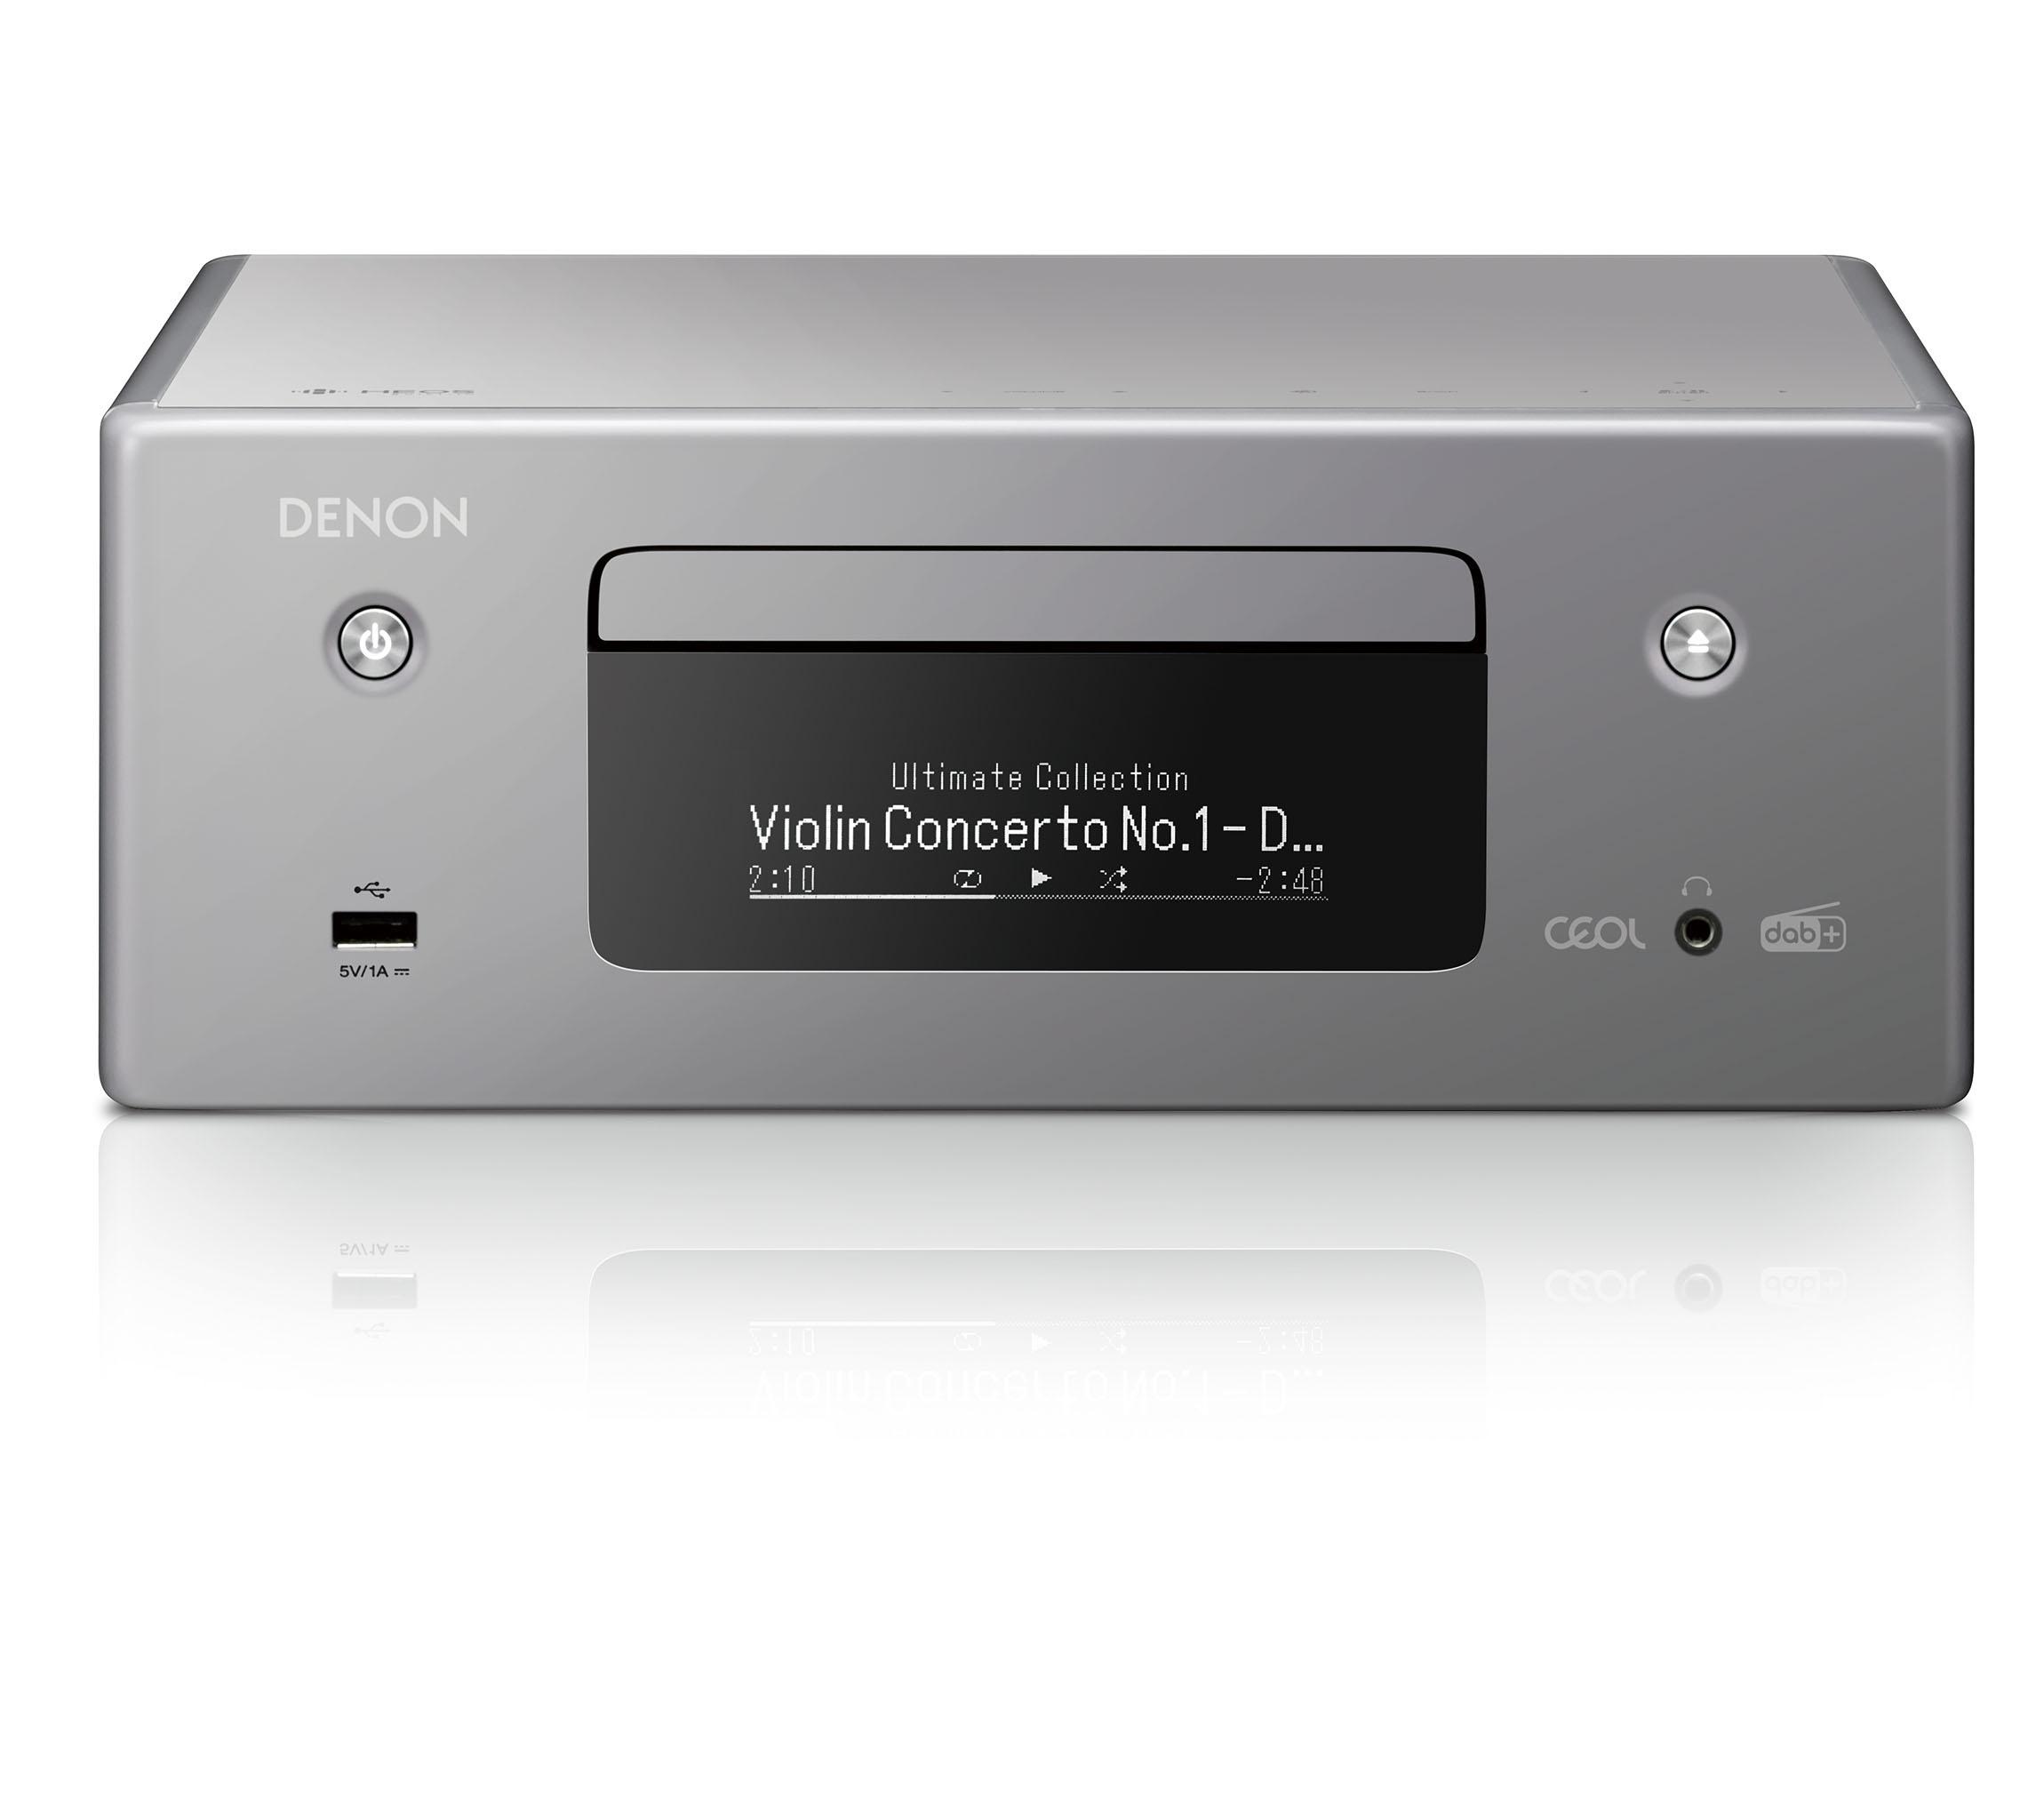 Denon RCD-N 11DAB grau Netzwerk-CD-Receiver 101283